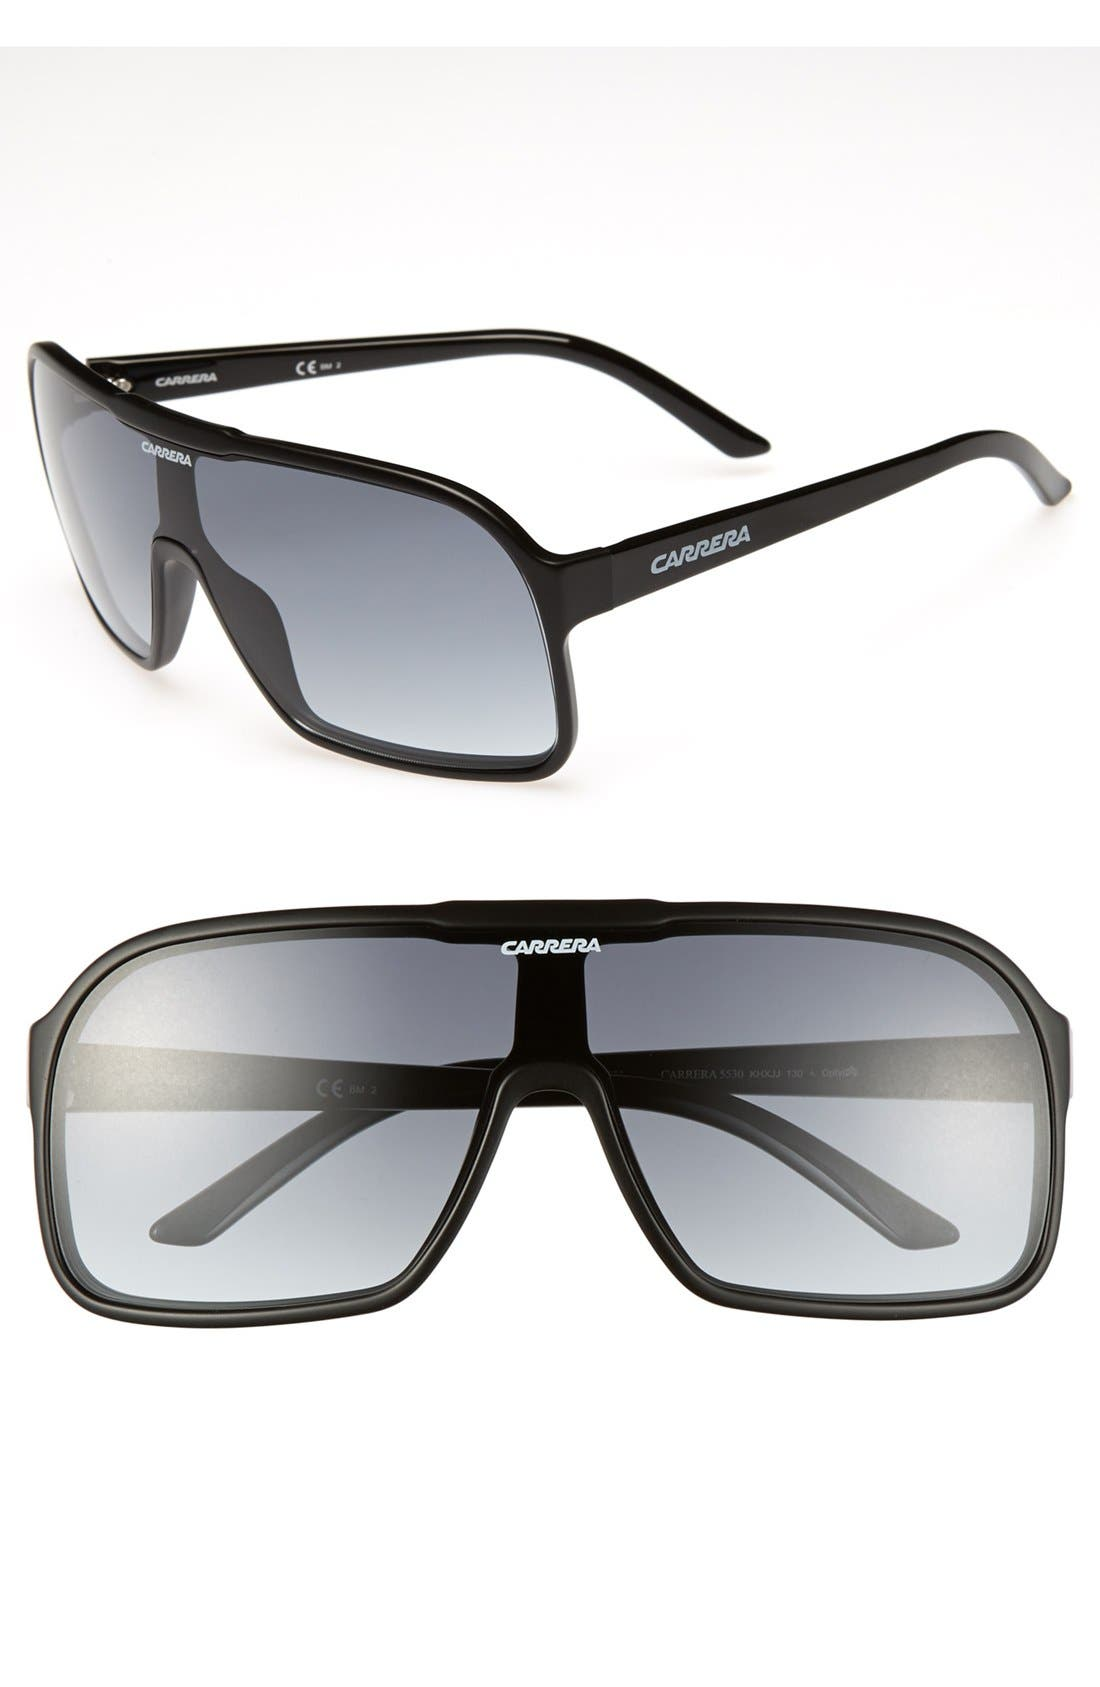 Main Image - Carrera Eyewear 99mm Sunglasses